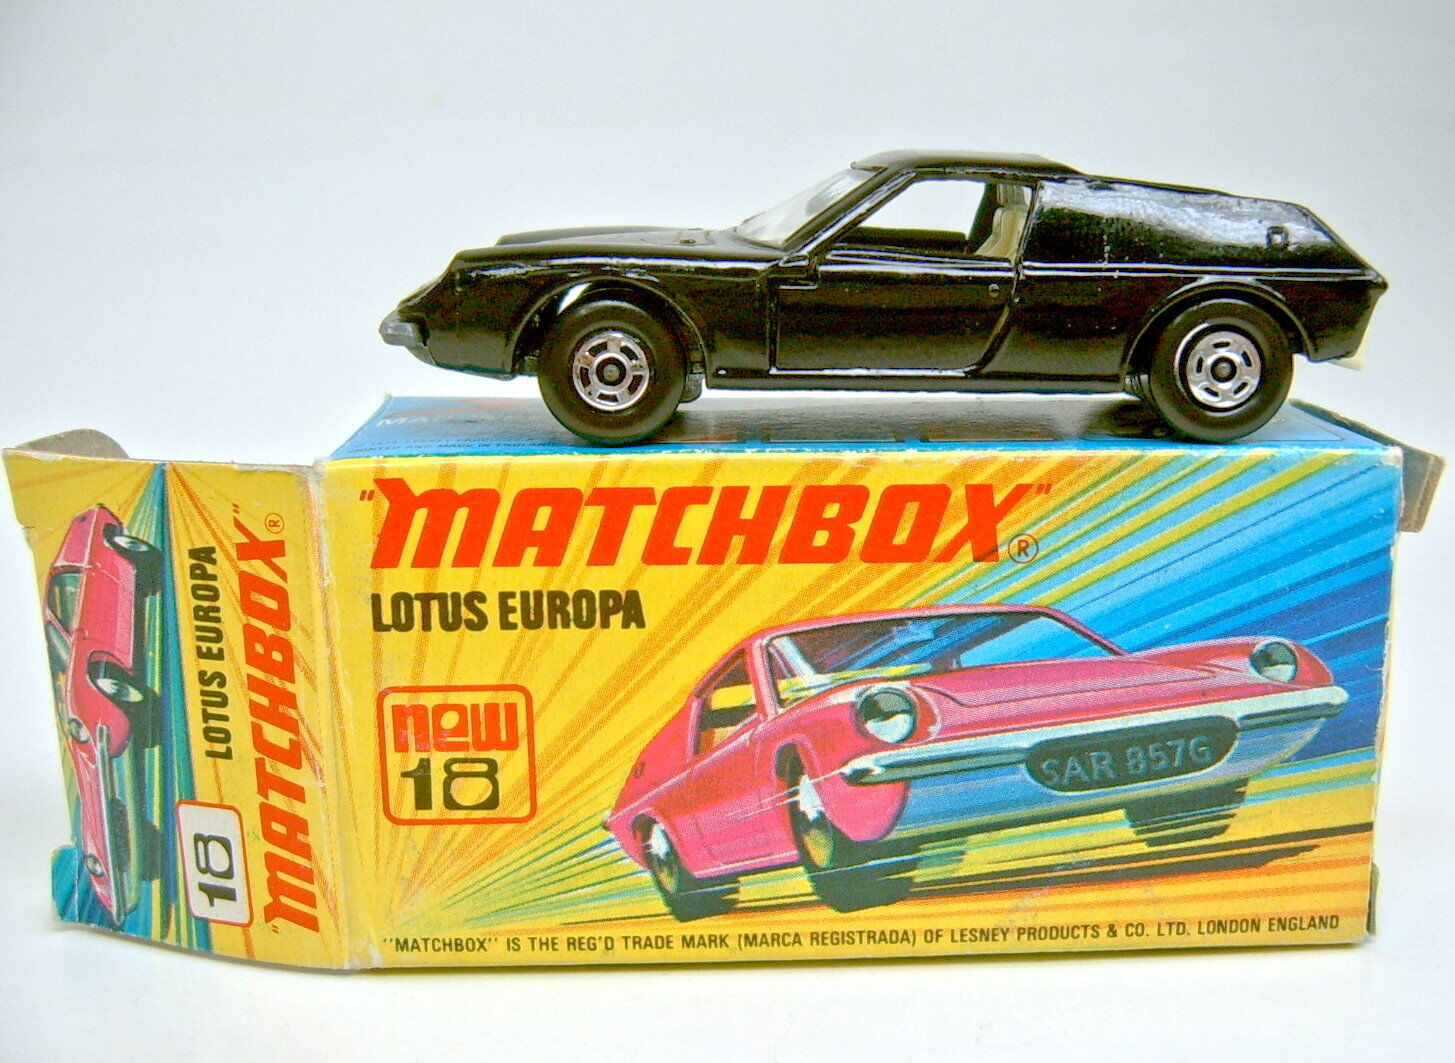 MATCHBOX SF Nº 5 a Lotus Europe Noir extrêmement rare  no. 18  Japon-Box